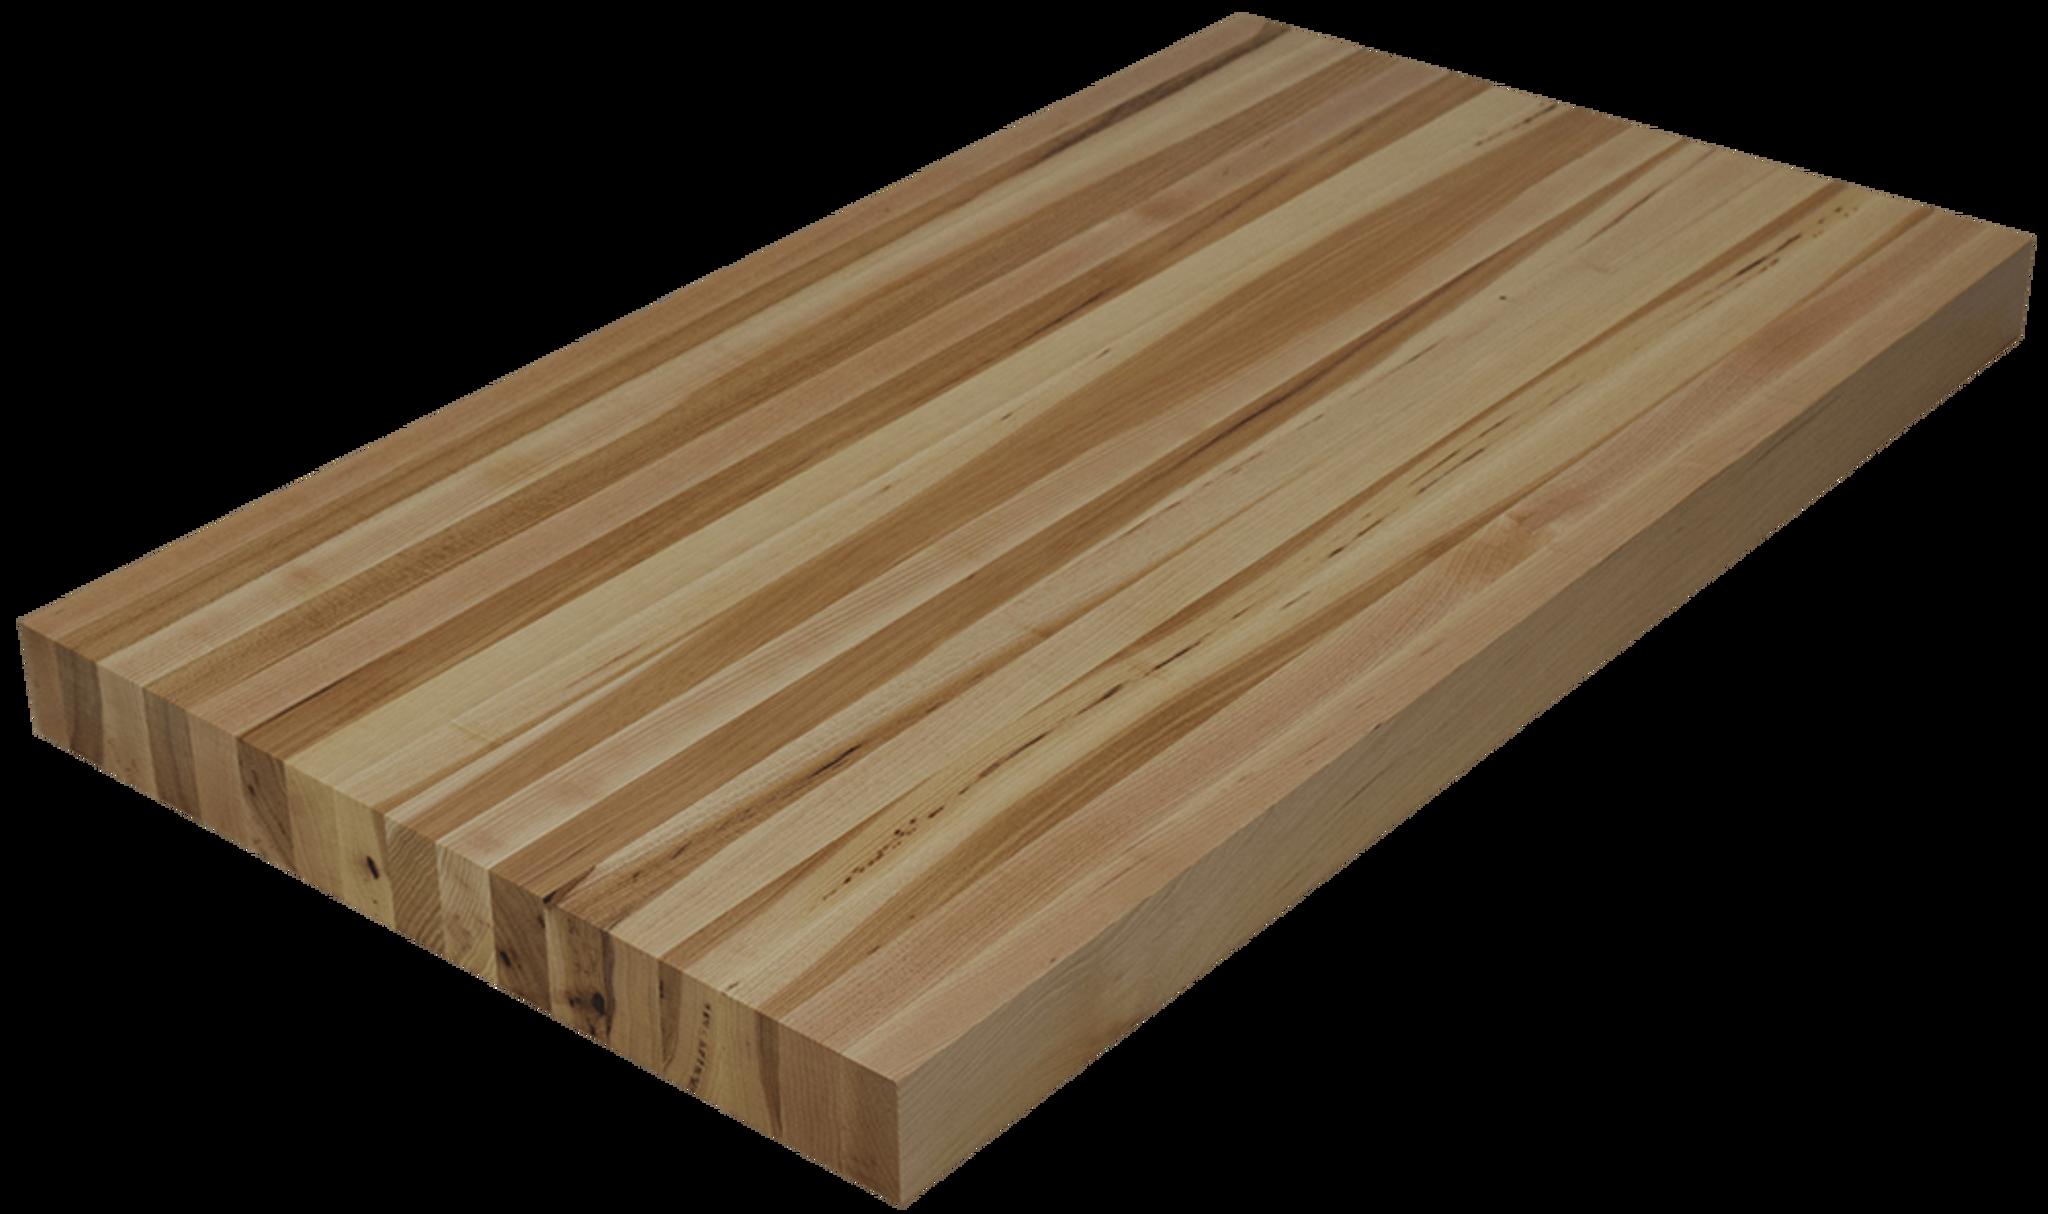 Hickory Edge Grain Butcher Block Countertop Hardwood Lumber Company